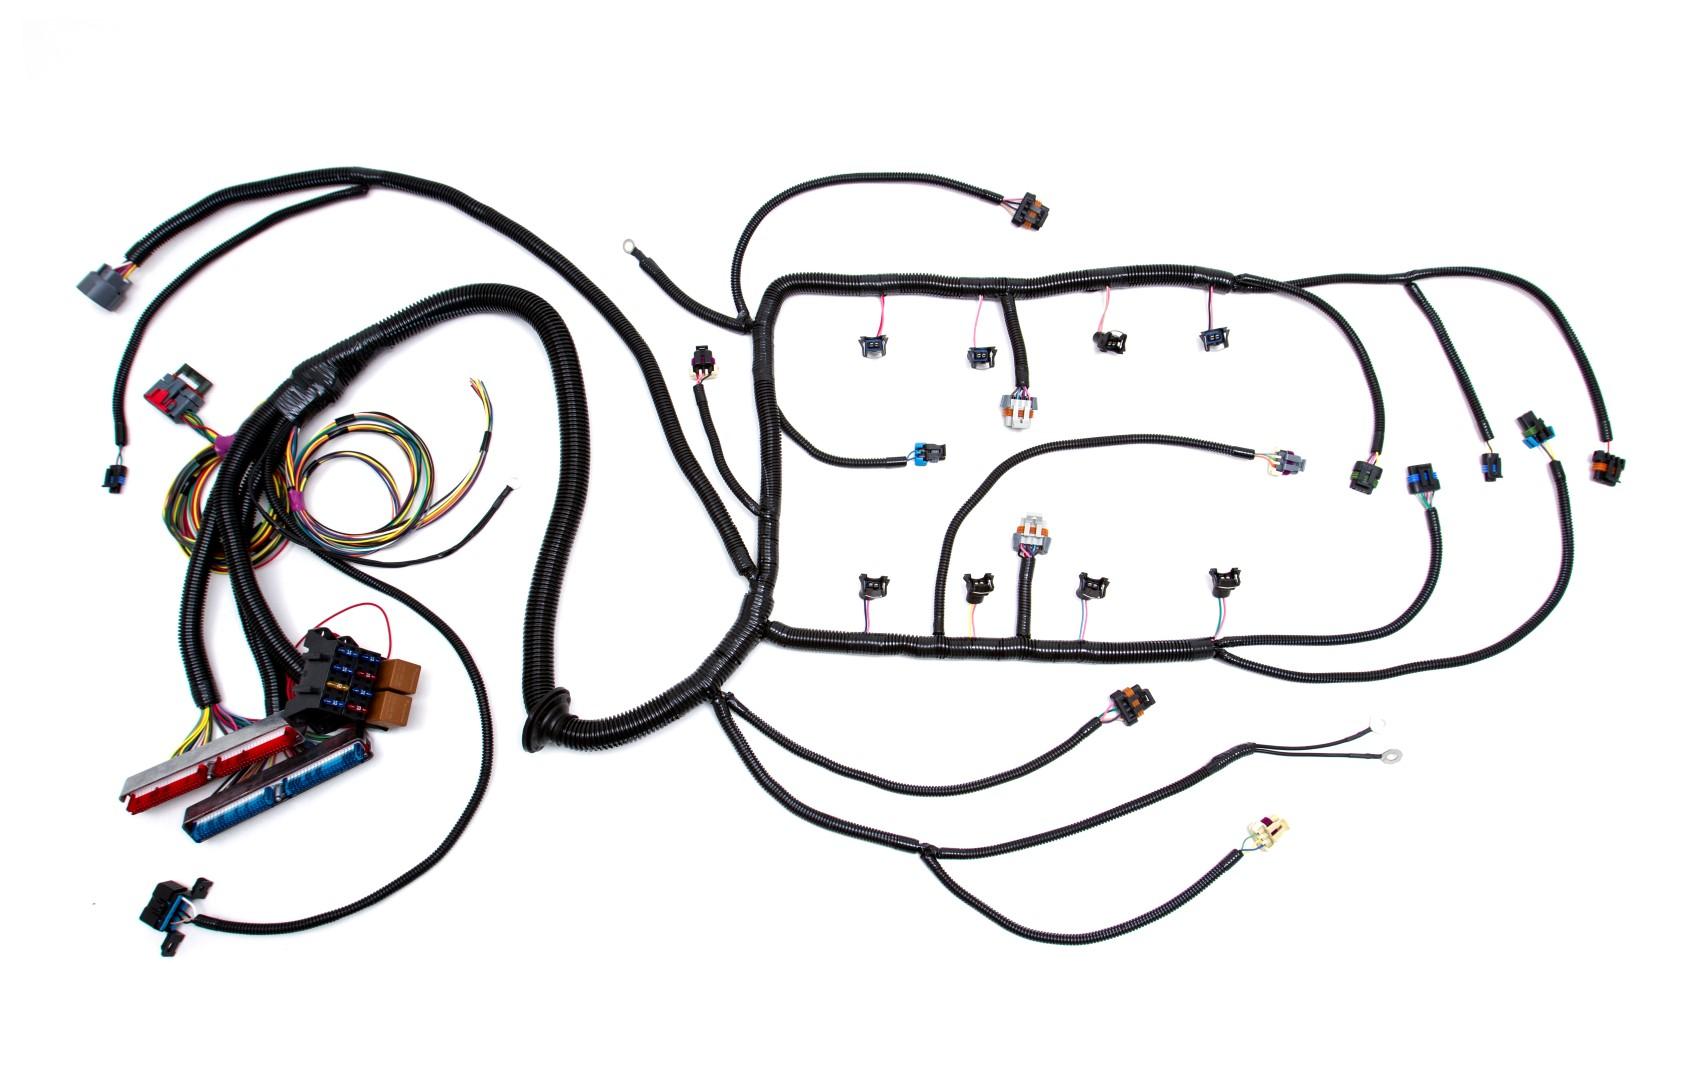 ls1 wire harness ls1 wiring ls1 swap